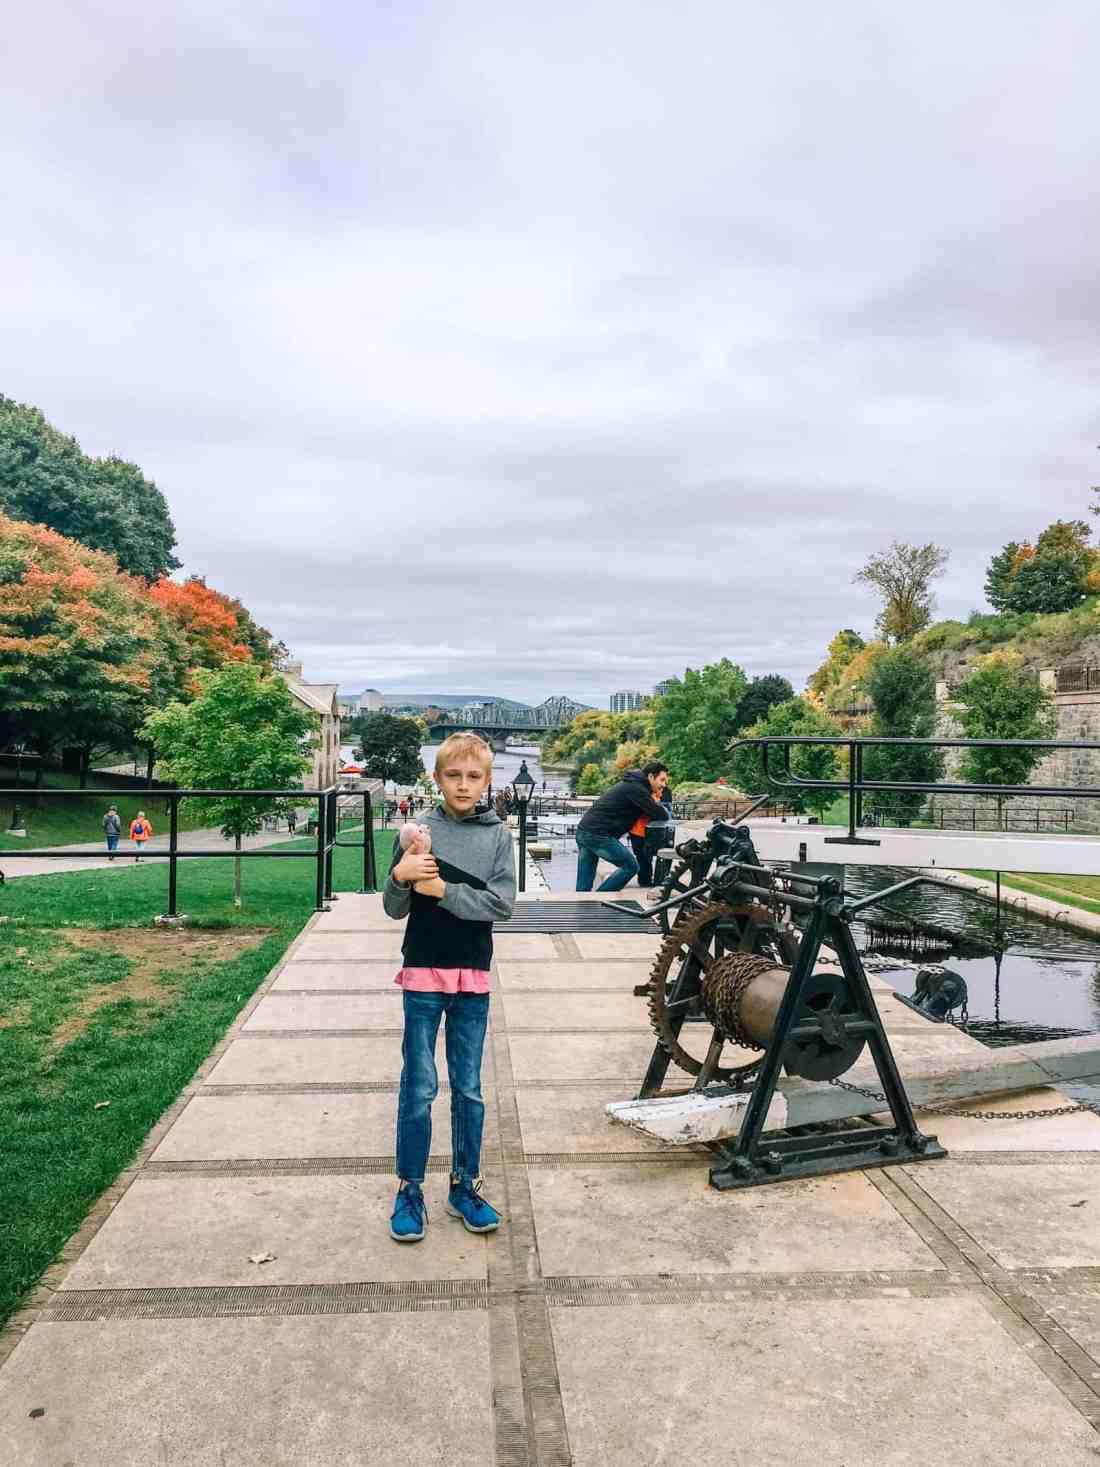 ottawa travel, Rideau canal locks are beautiful in any season. We enjoyed the fall colors.-1098